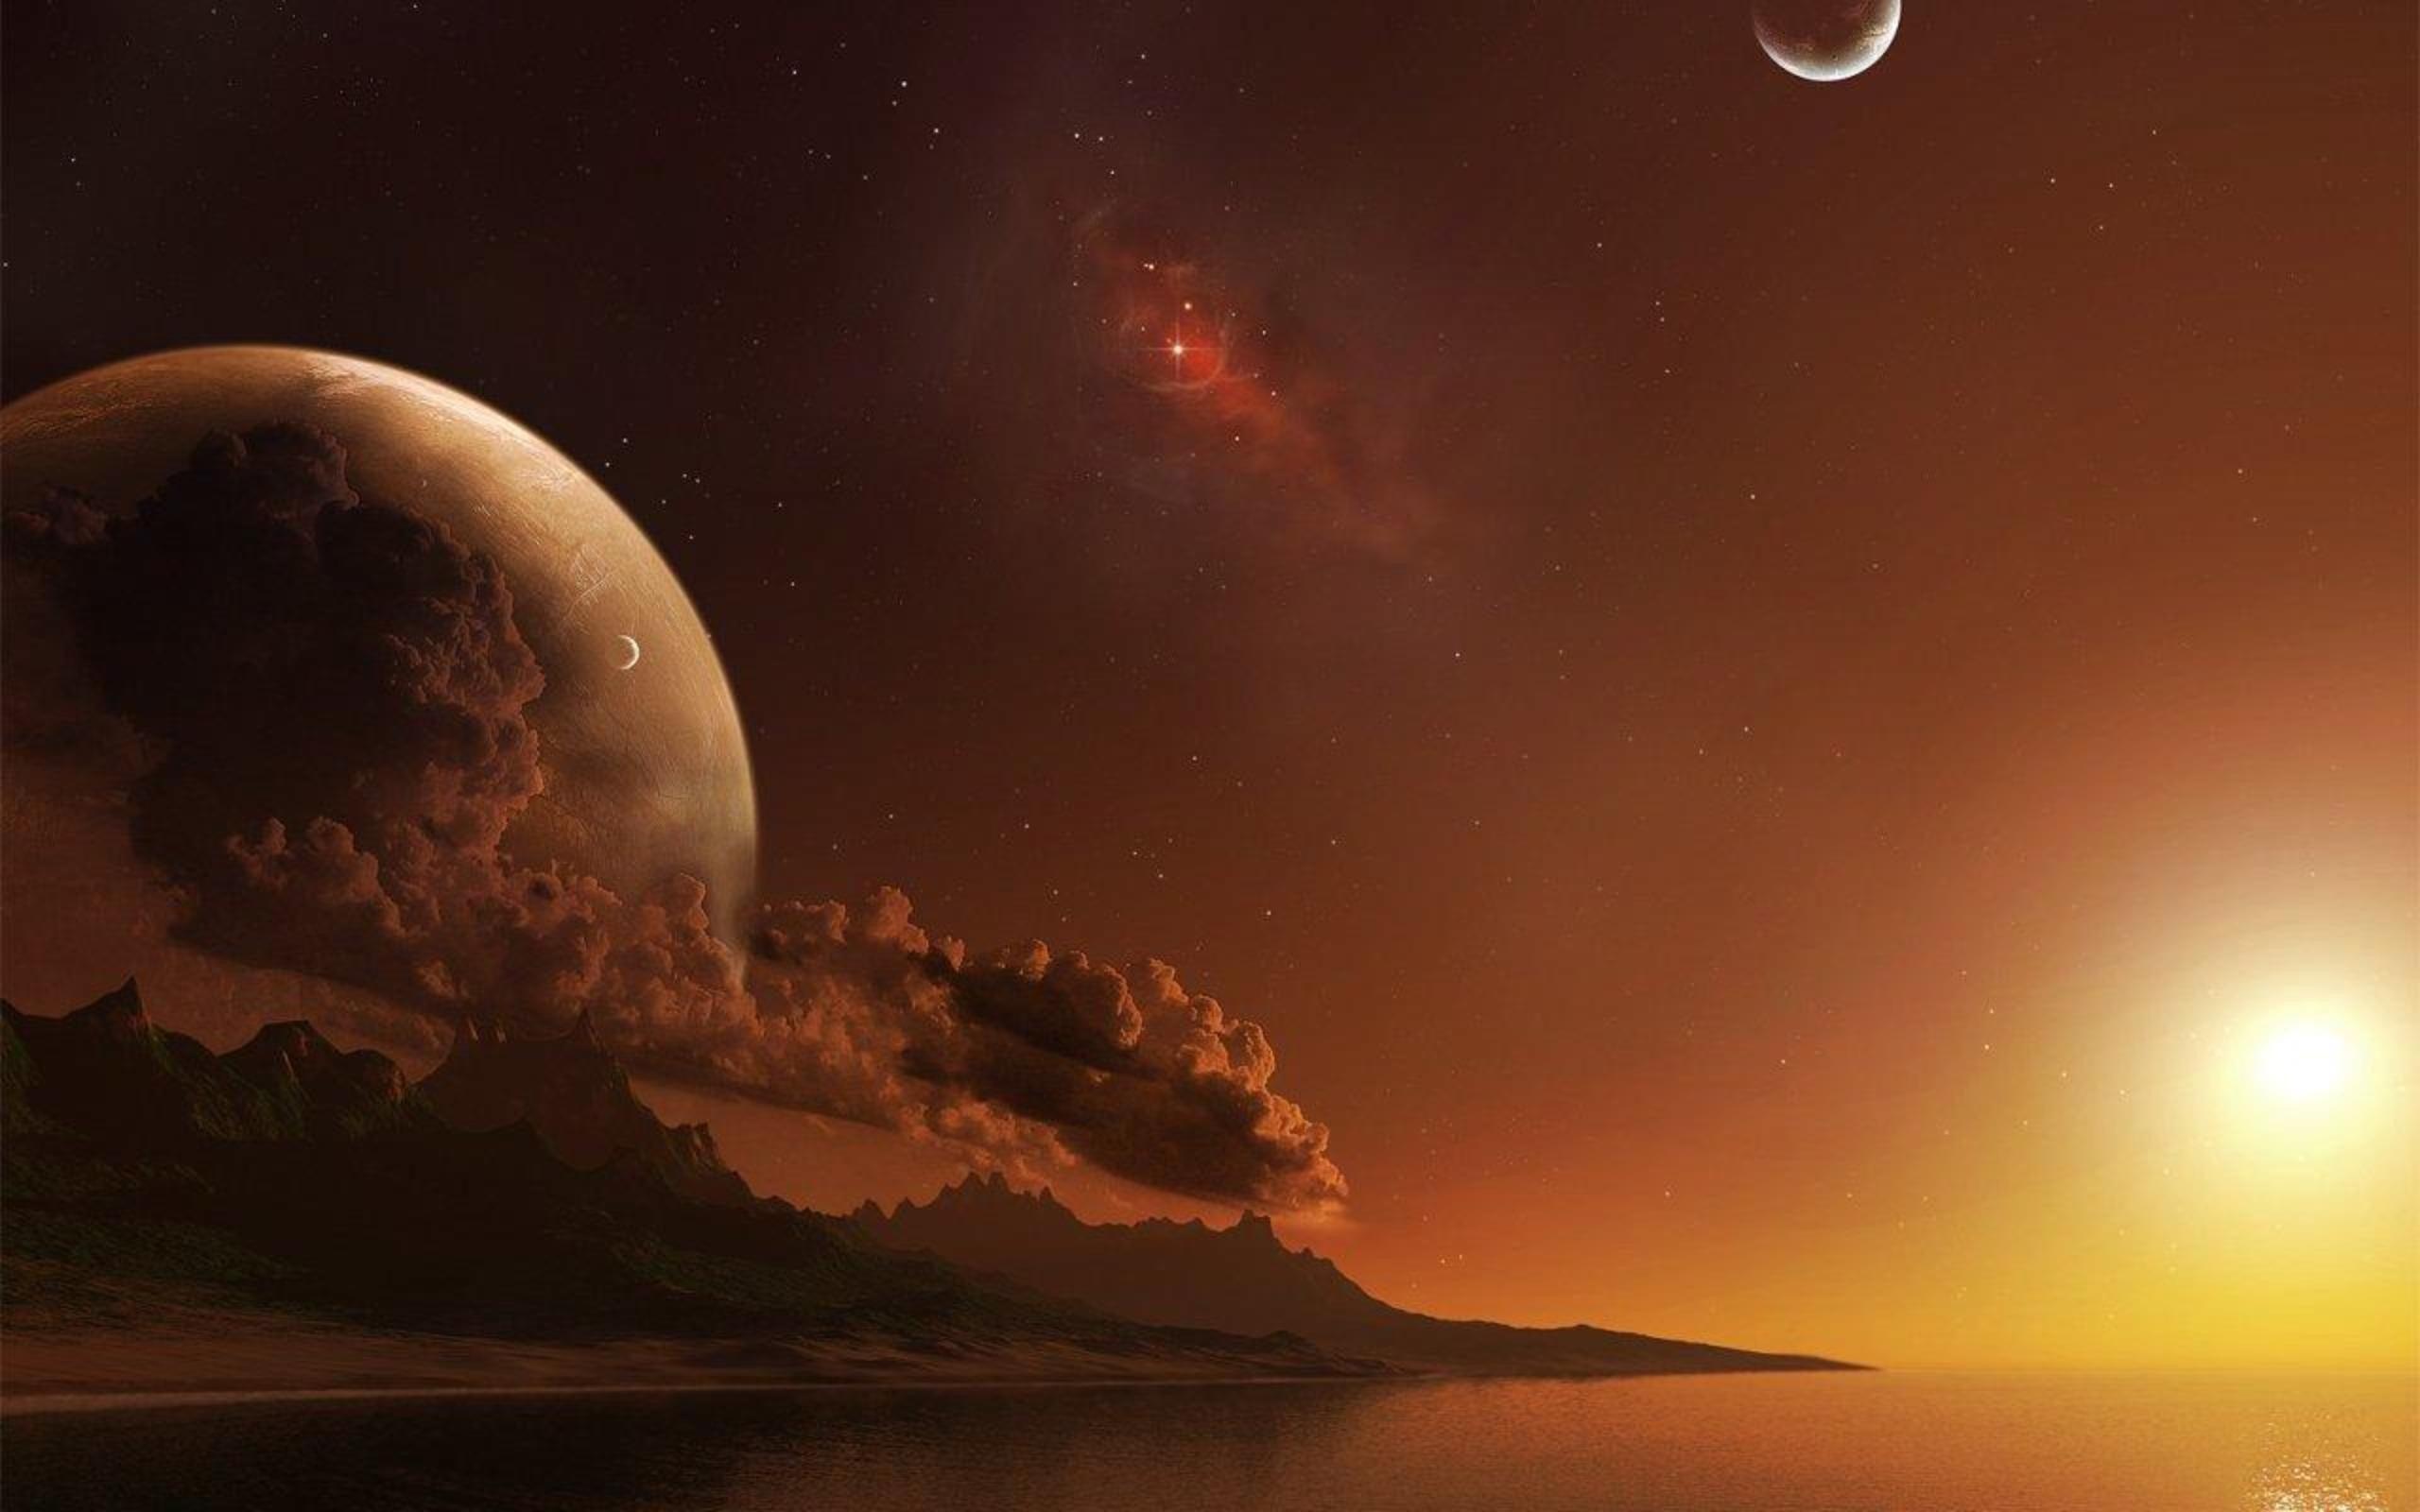 Digital art alien landscapes wallpaper   2560x1600 ...